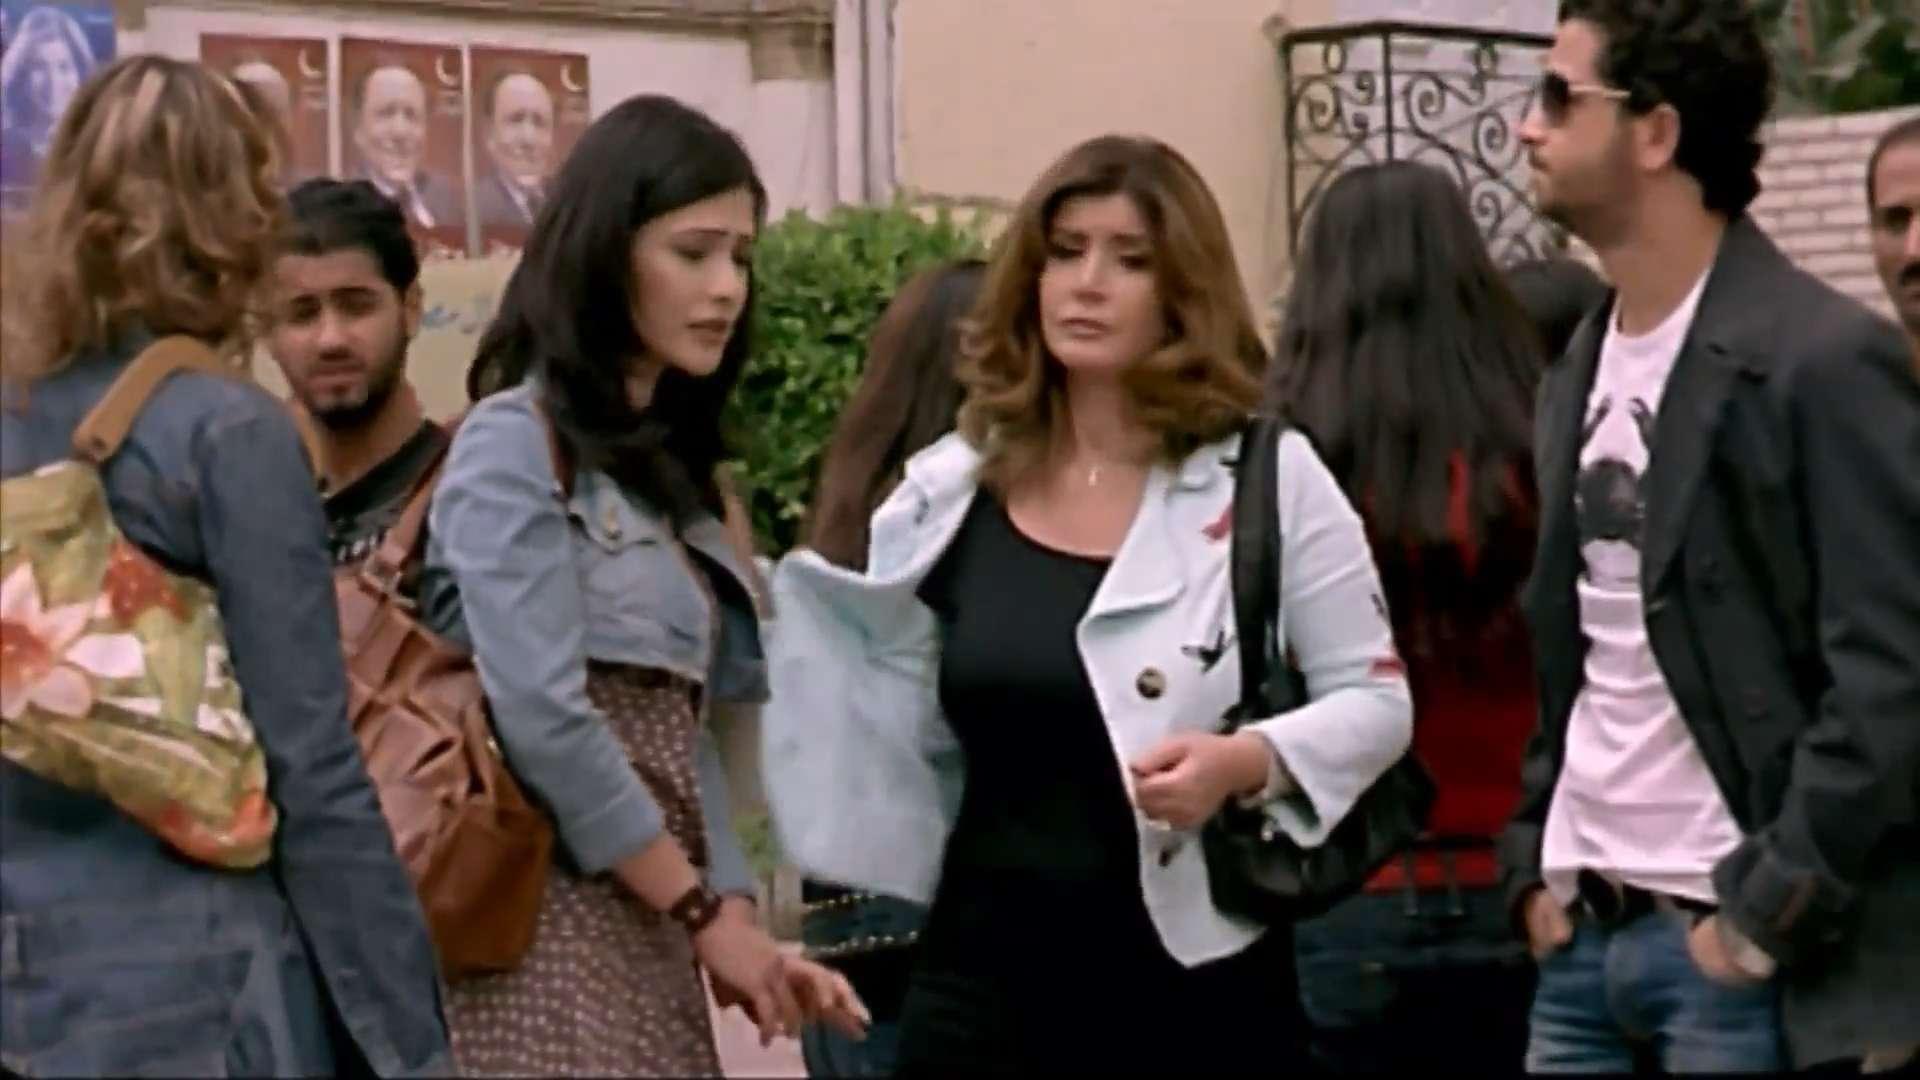 [فيلم][تورنت][تحميل][مرجان أحمد مرجان][2007][1080p][Web-DL] 3 arabp2p.com